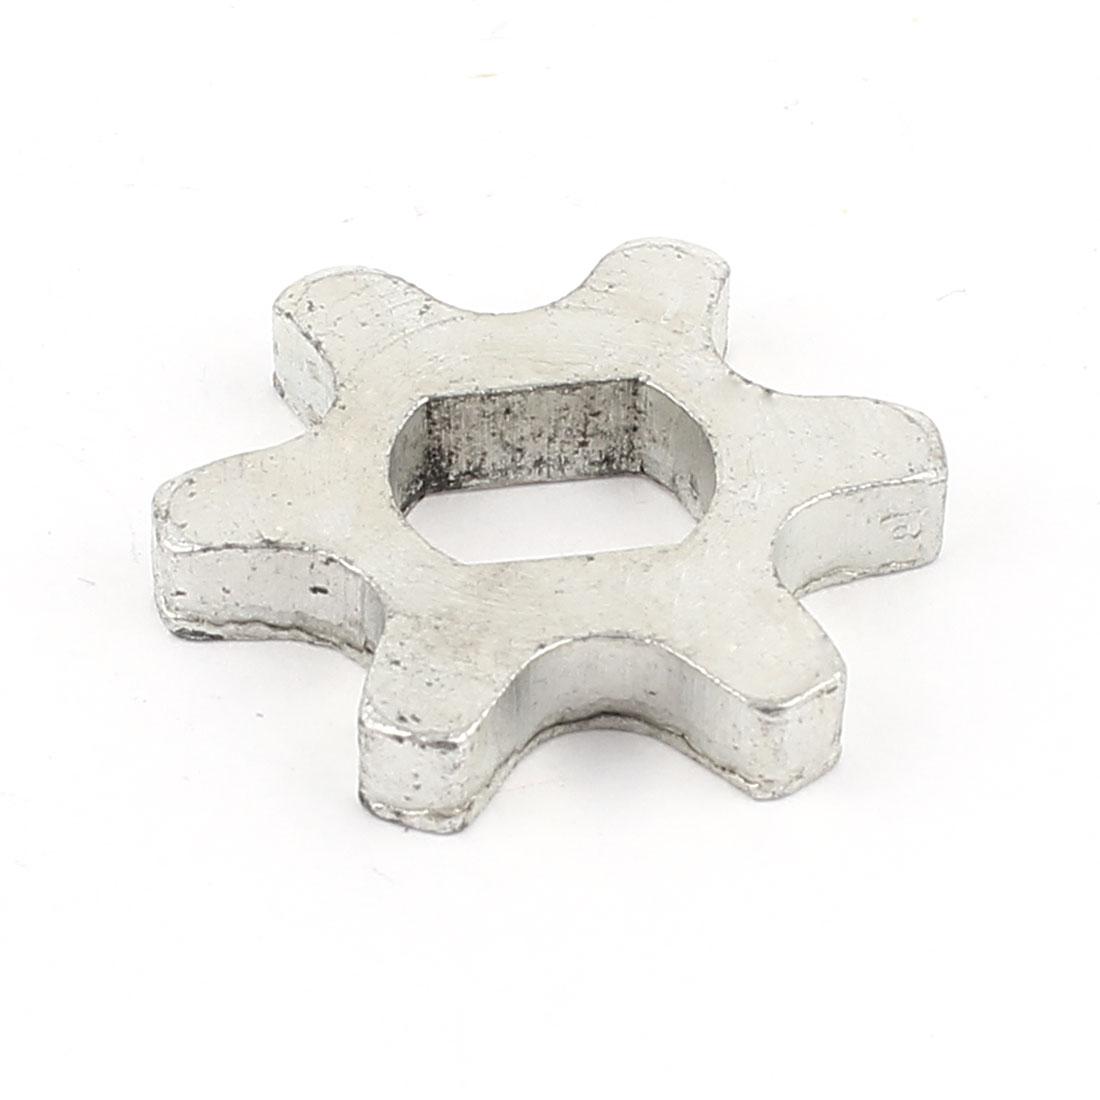 Repair Part 6 Teeth Metal 5016 Sprocket Silver Tone for Electric Hammer